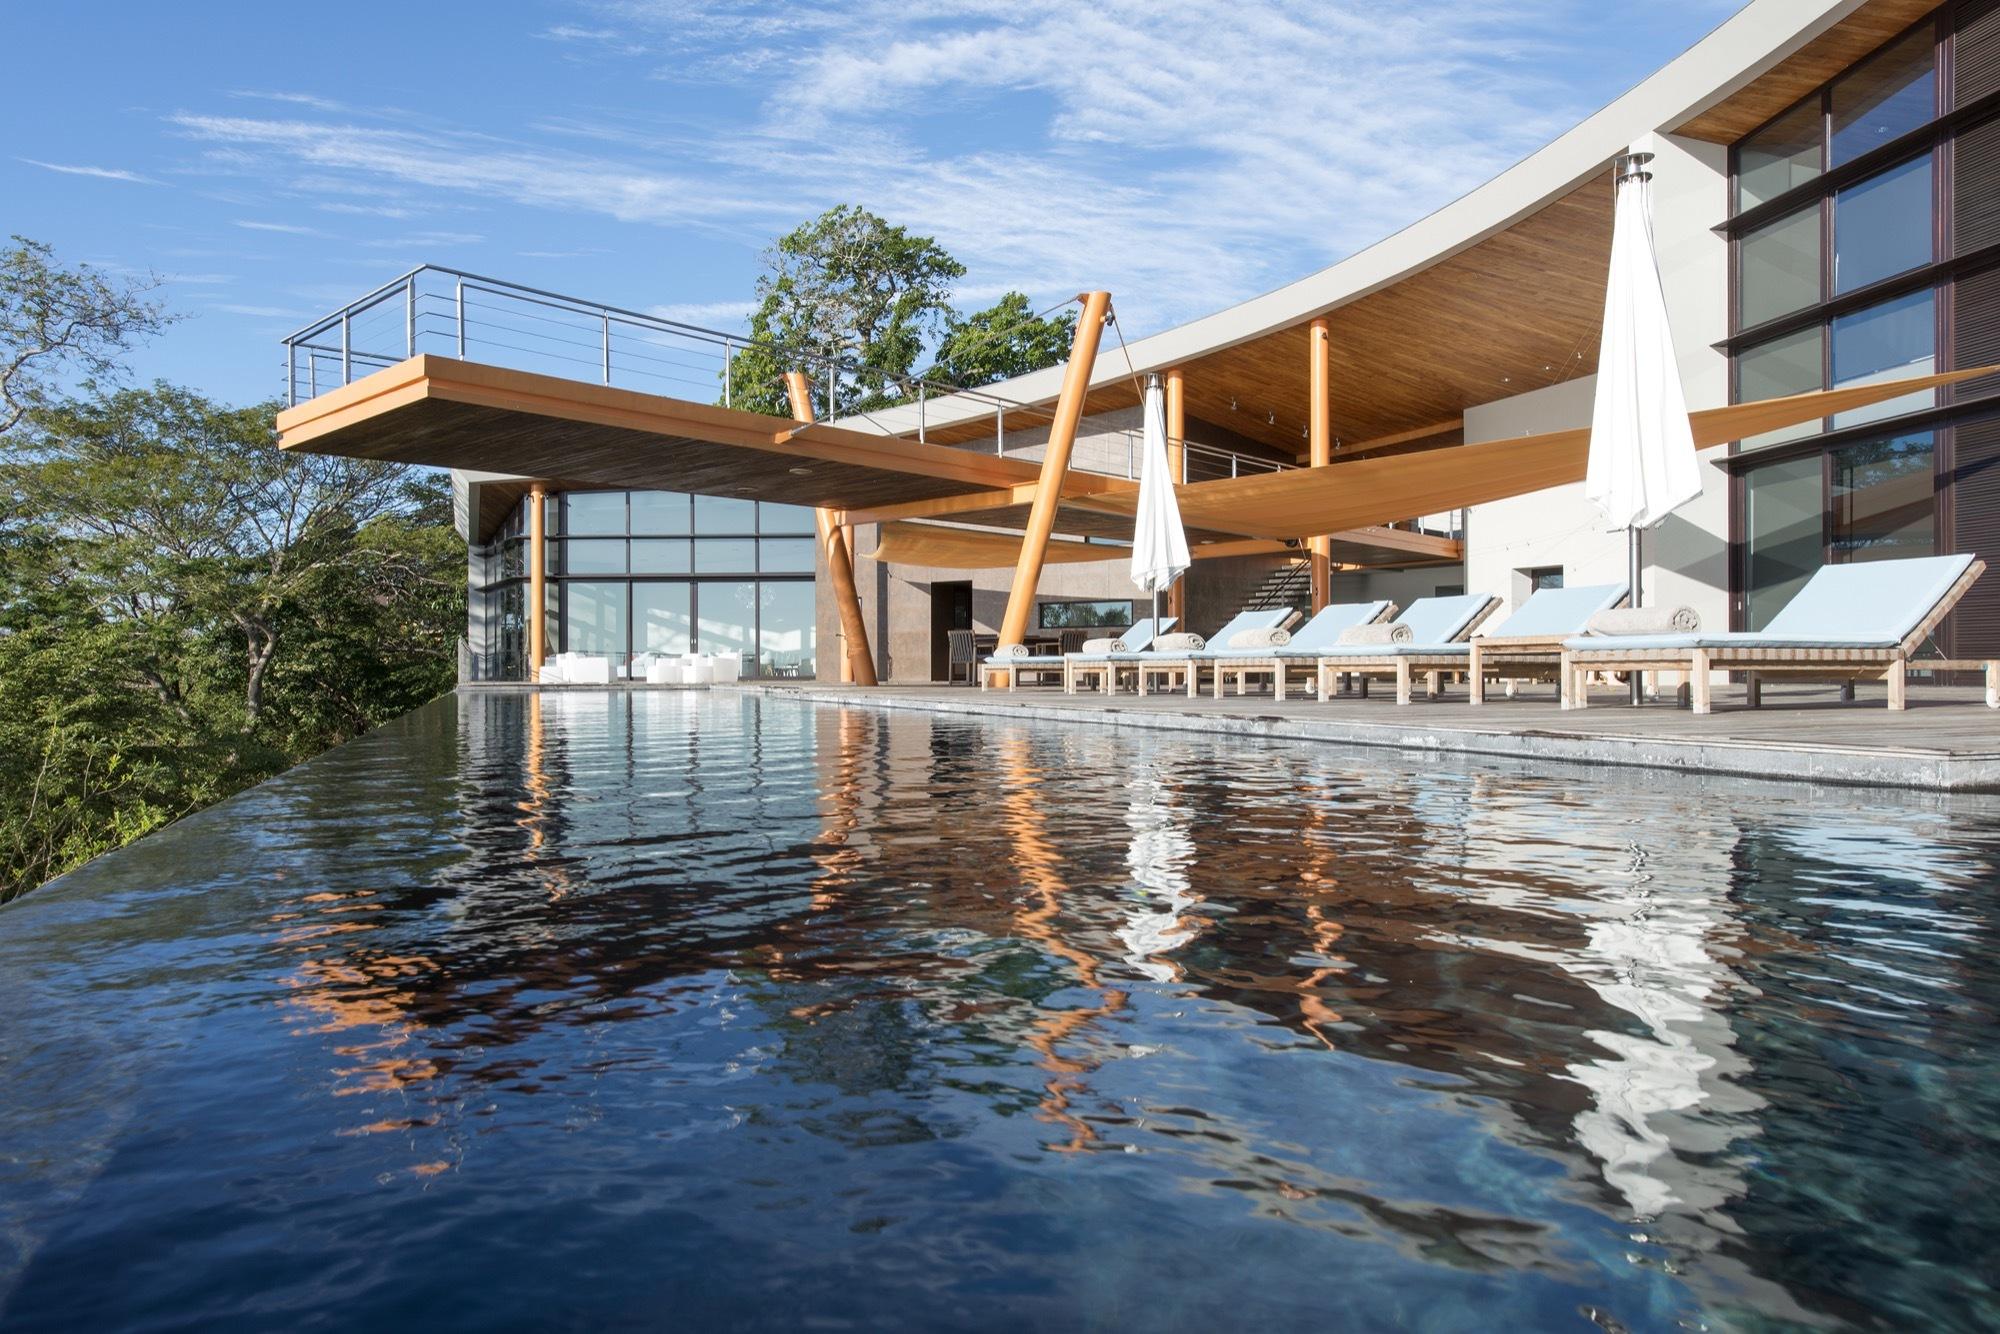 Galeria De Resid 234 Ncia C 233 U Mar Barnes Coy Architects